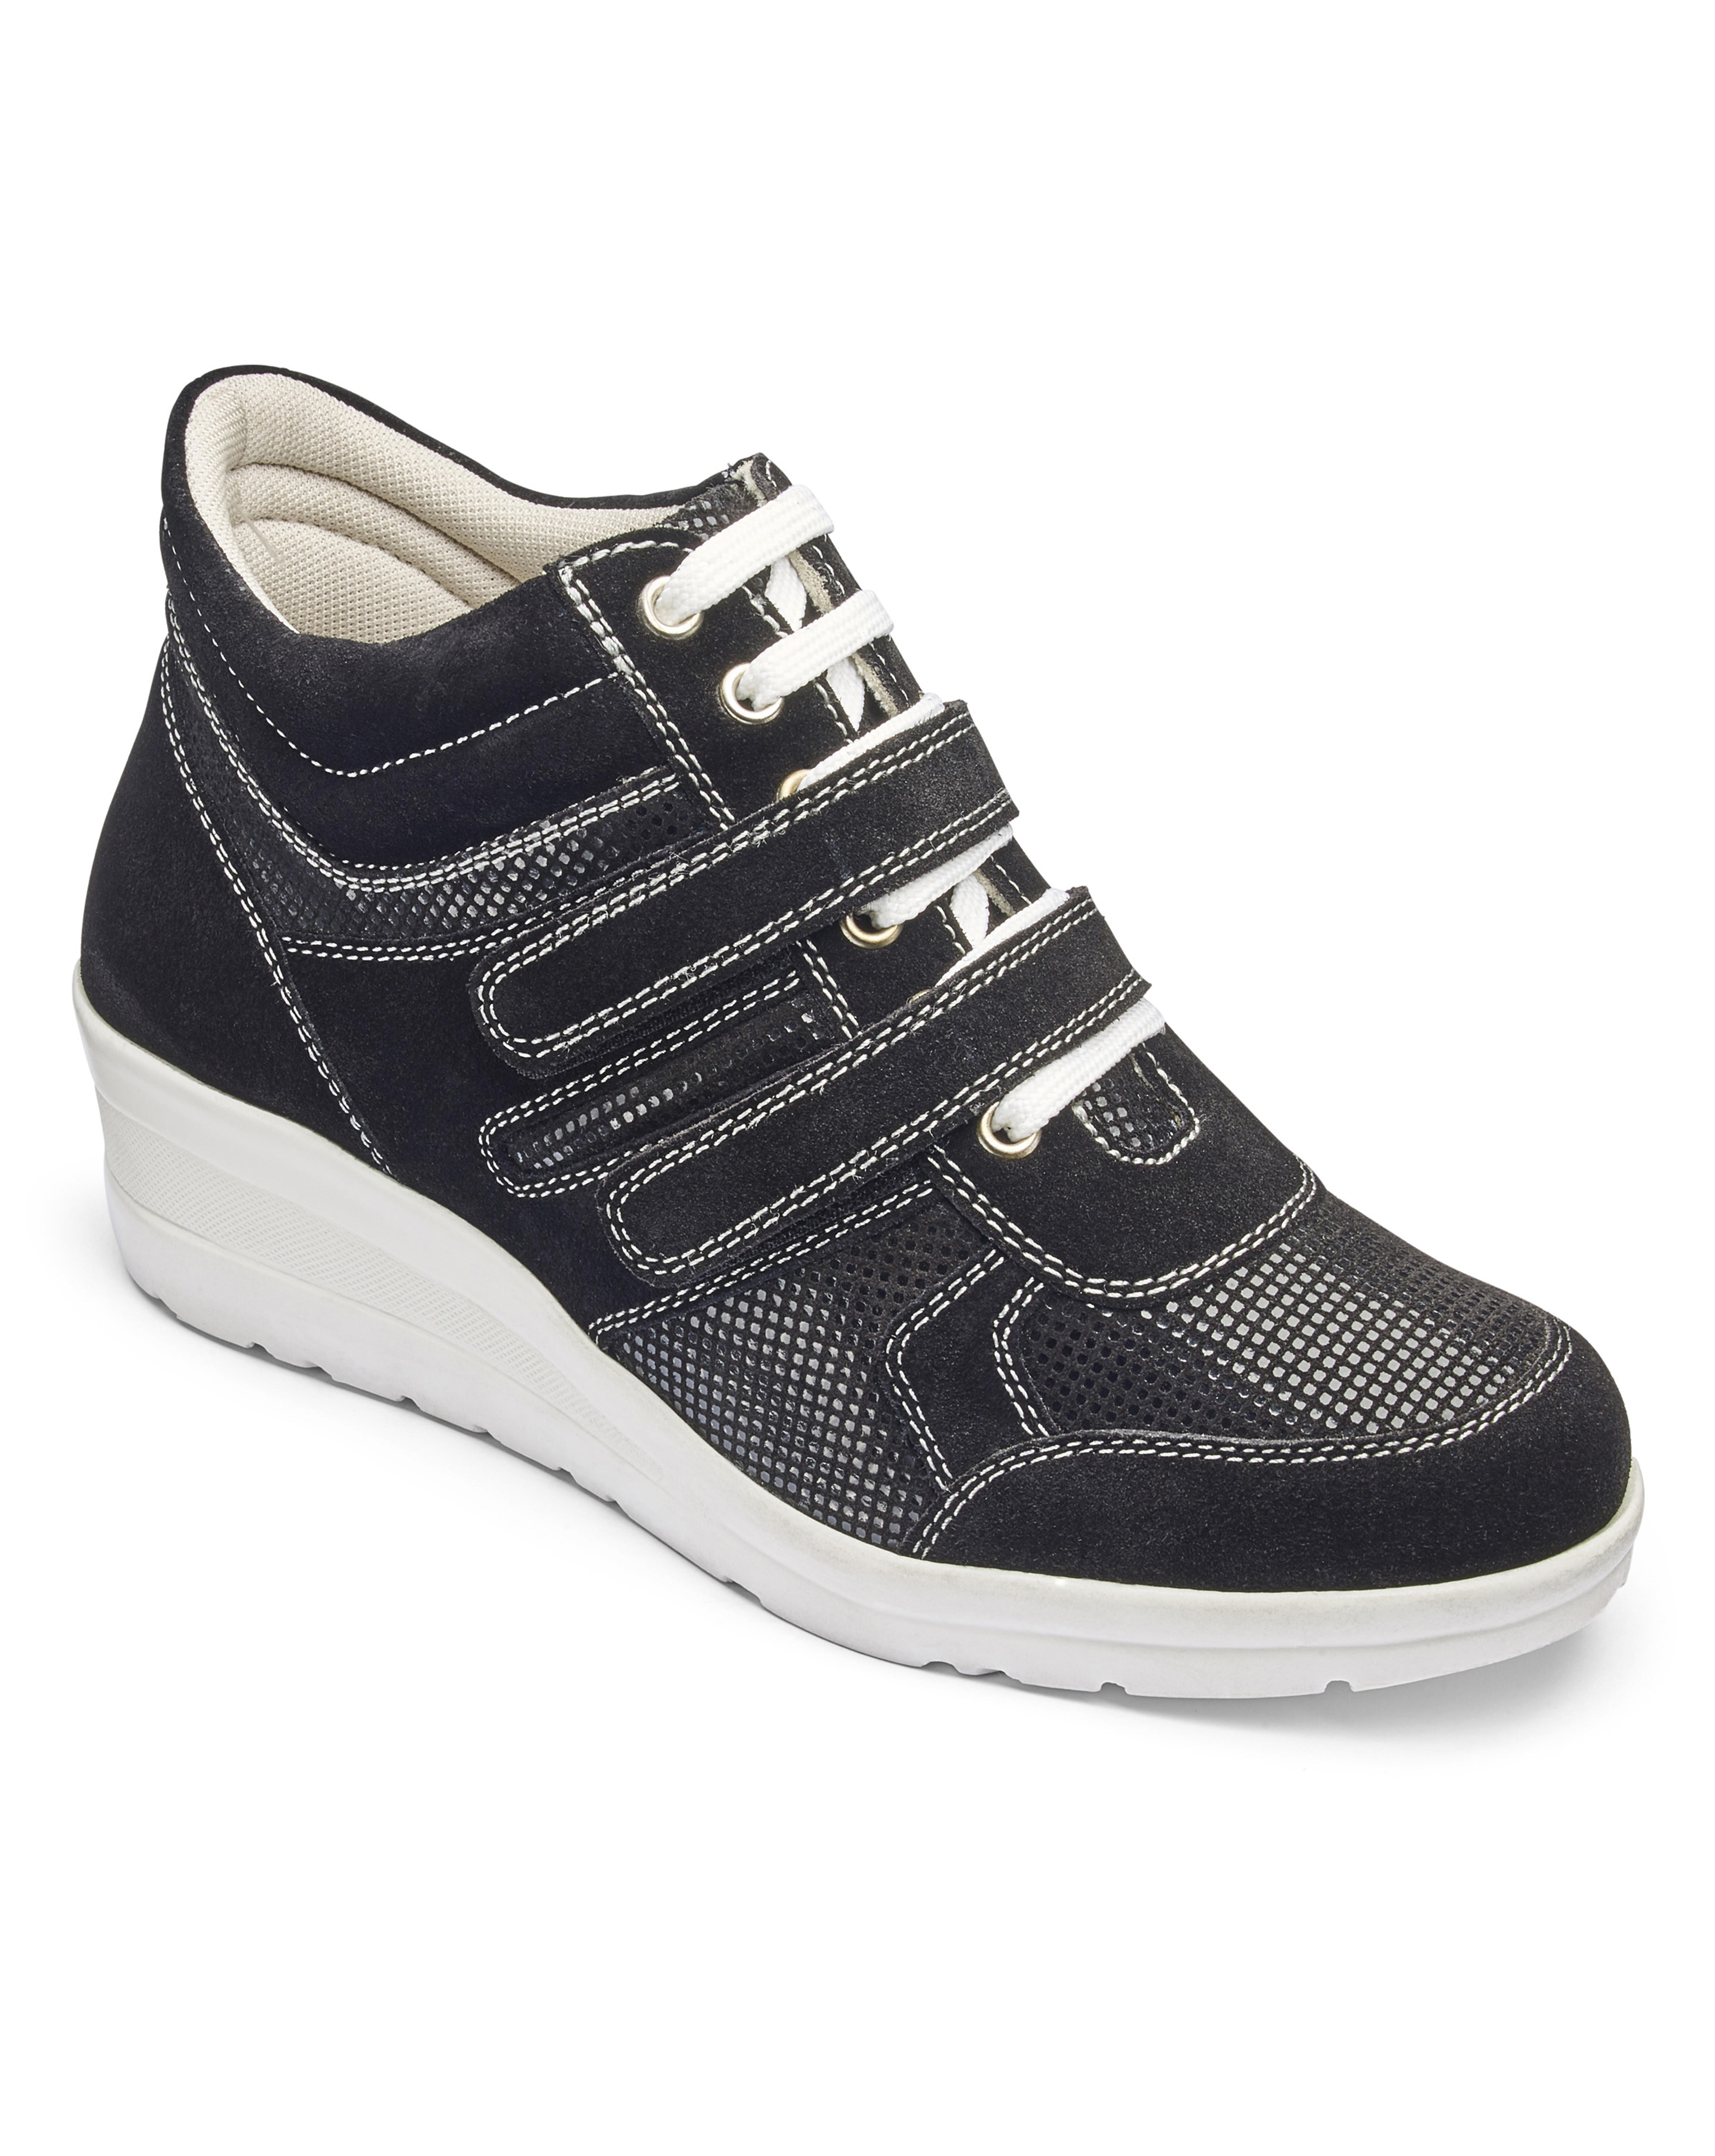 Shoes Womens Cushion Walk Lace